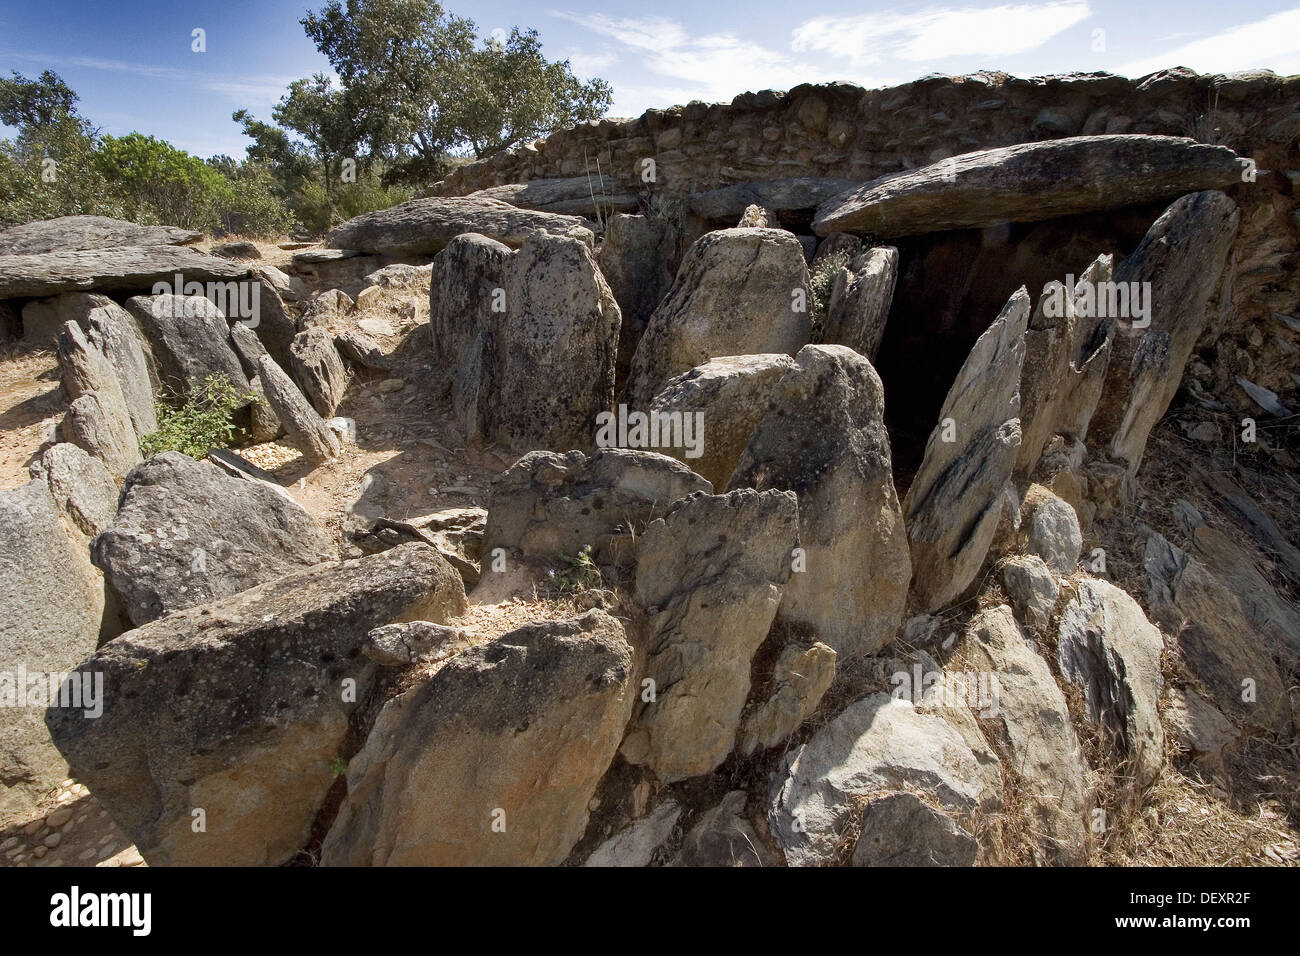 Prehistorical dolmen at El Pozuelo, near Zalamea la Real. Huelva province, Andalusia. Spain - Stock Image